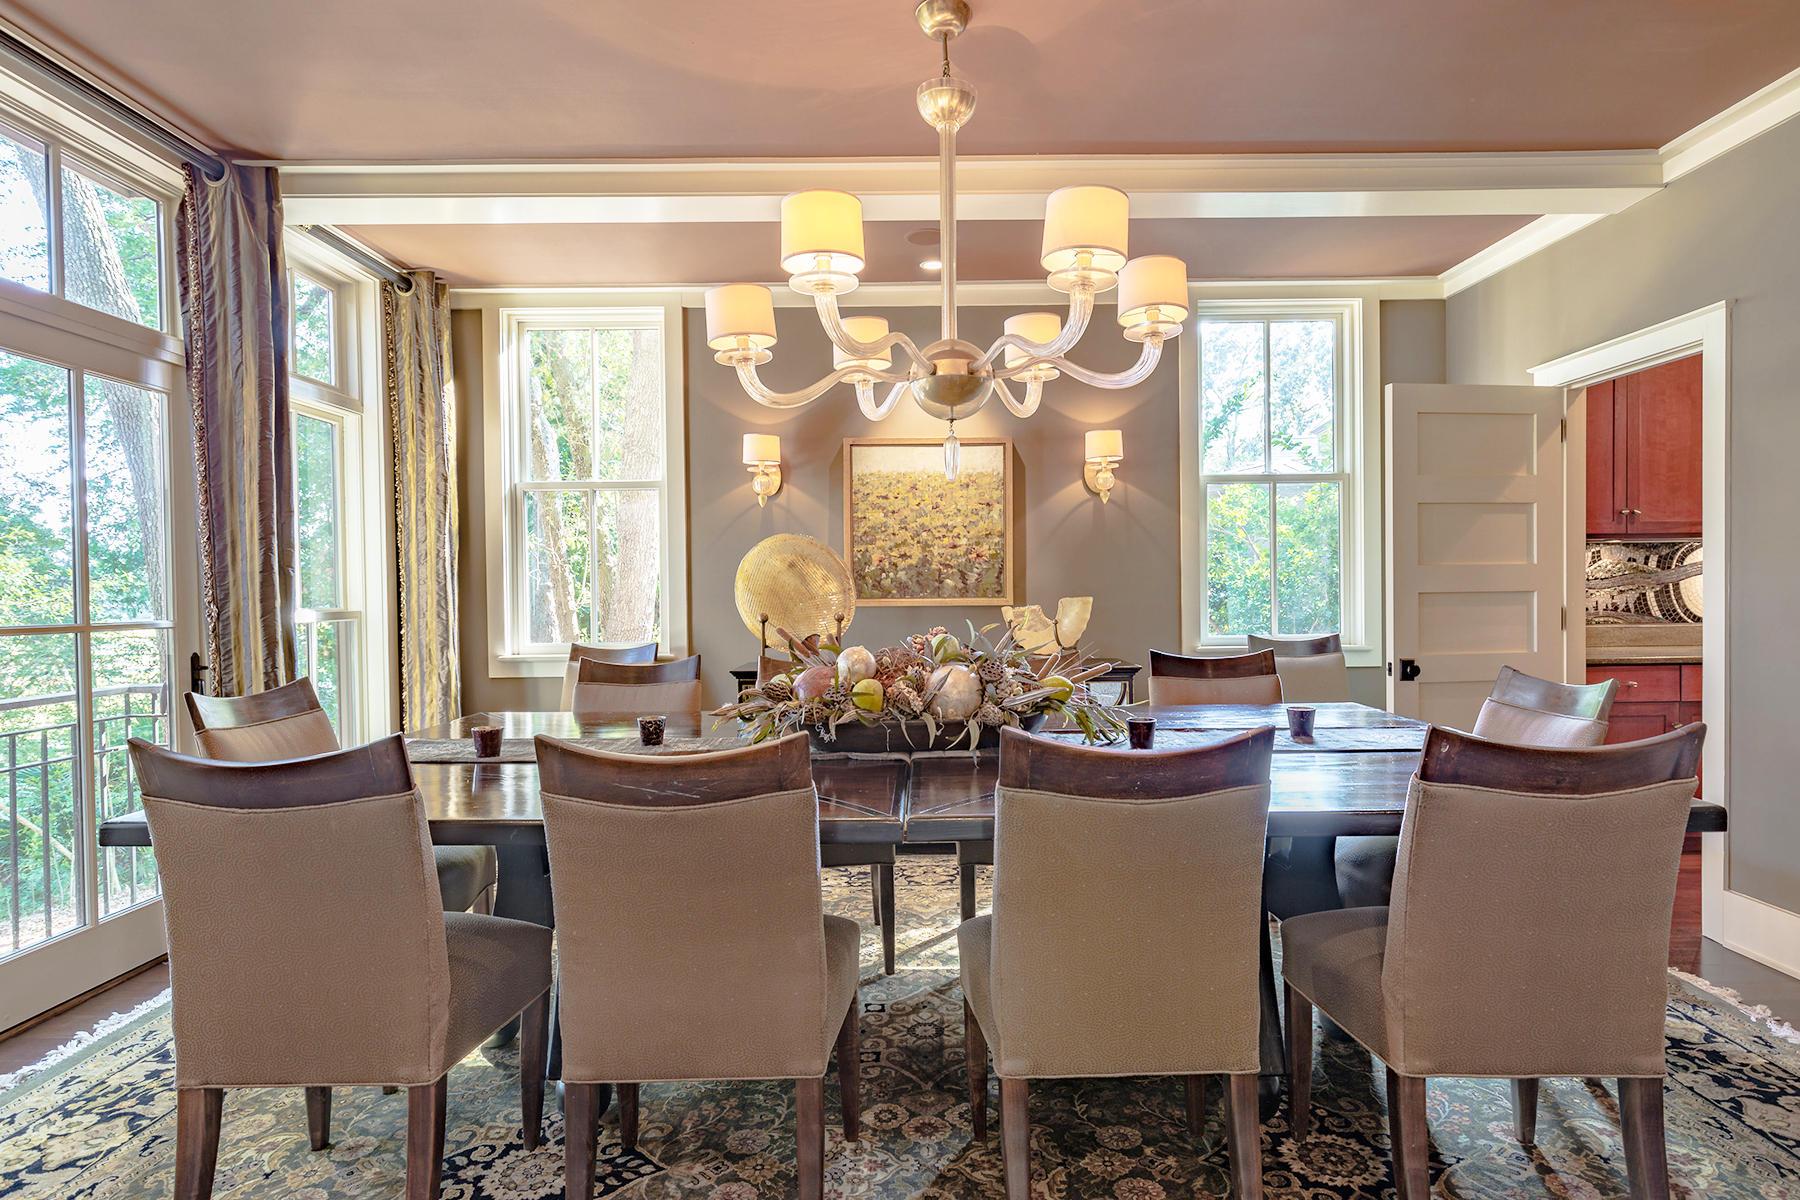 Ellis Oaks Homes For Sale - 672 Ellis Oak, Charleston, SC - 19